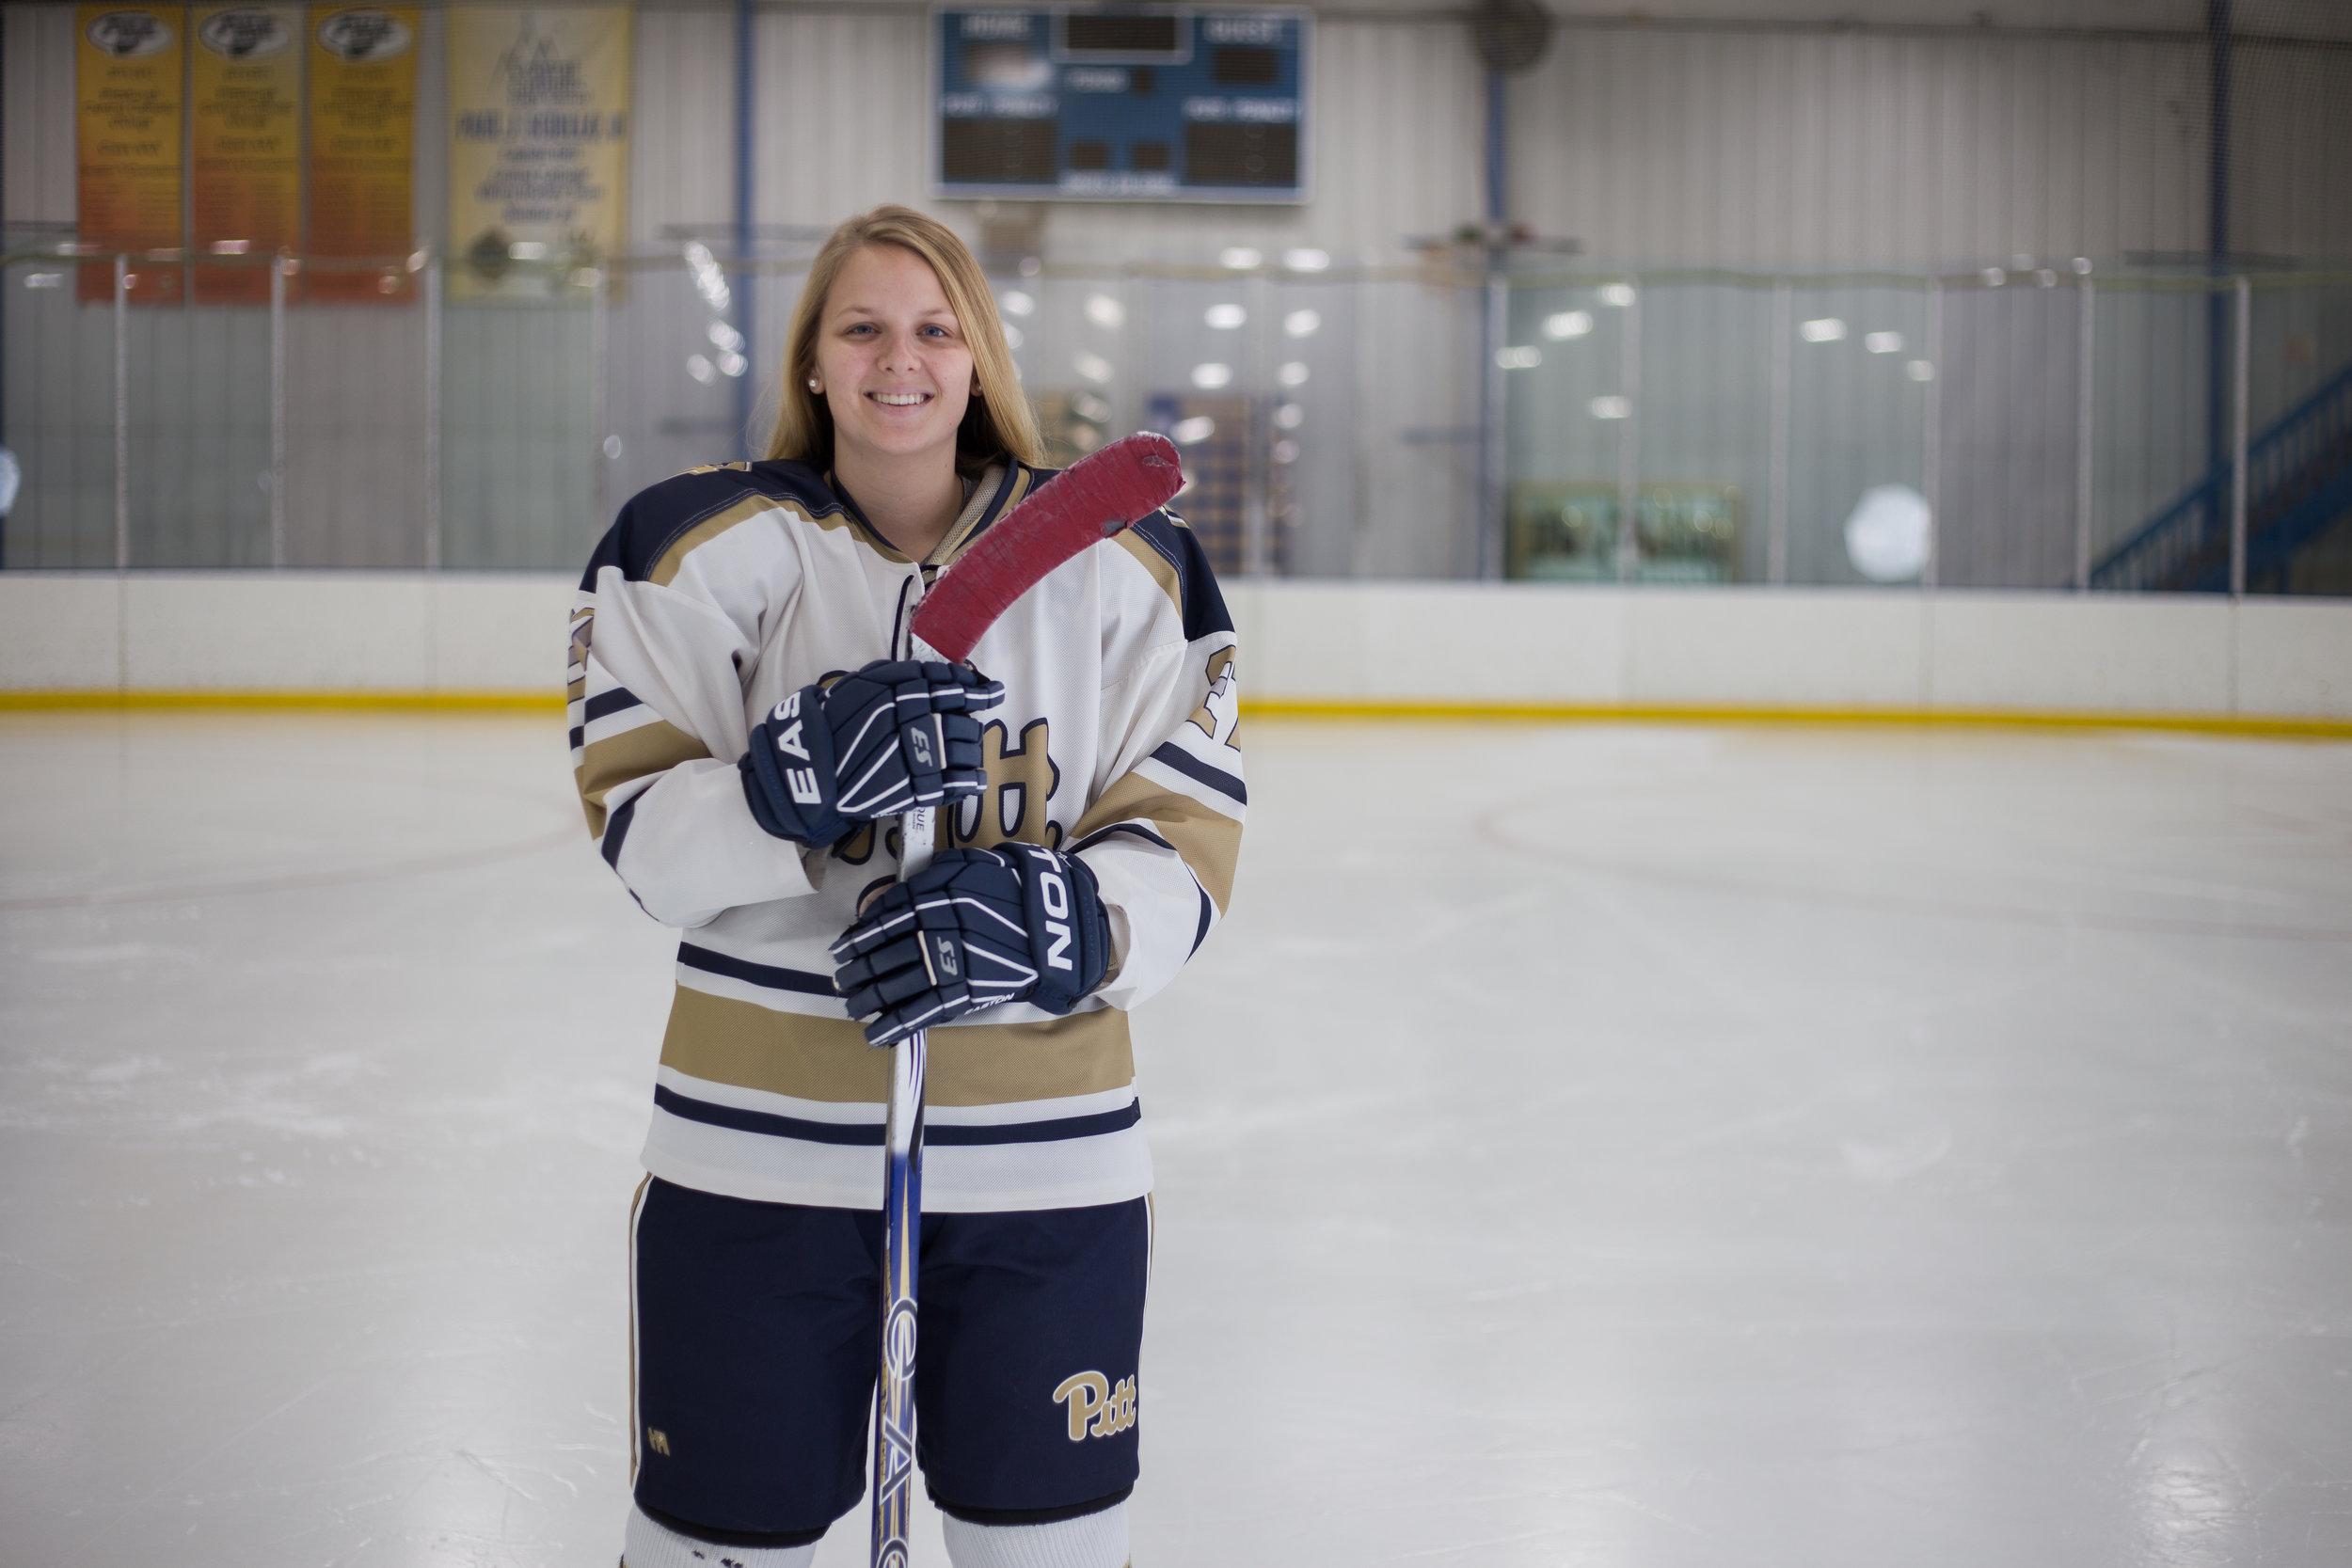 hockeyPortraits-8.JPG